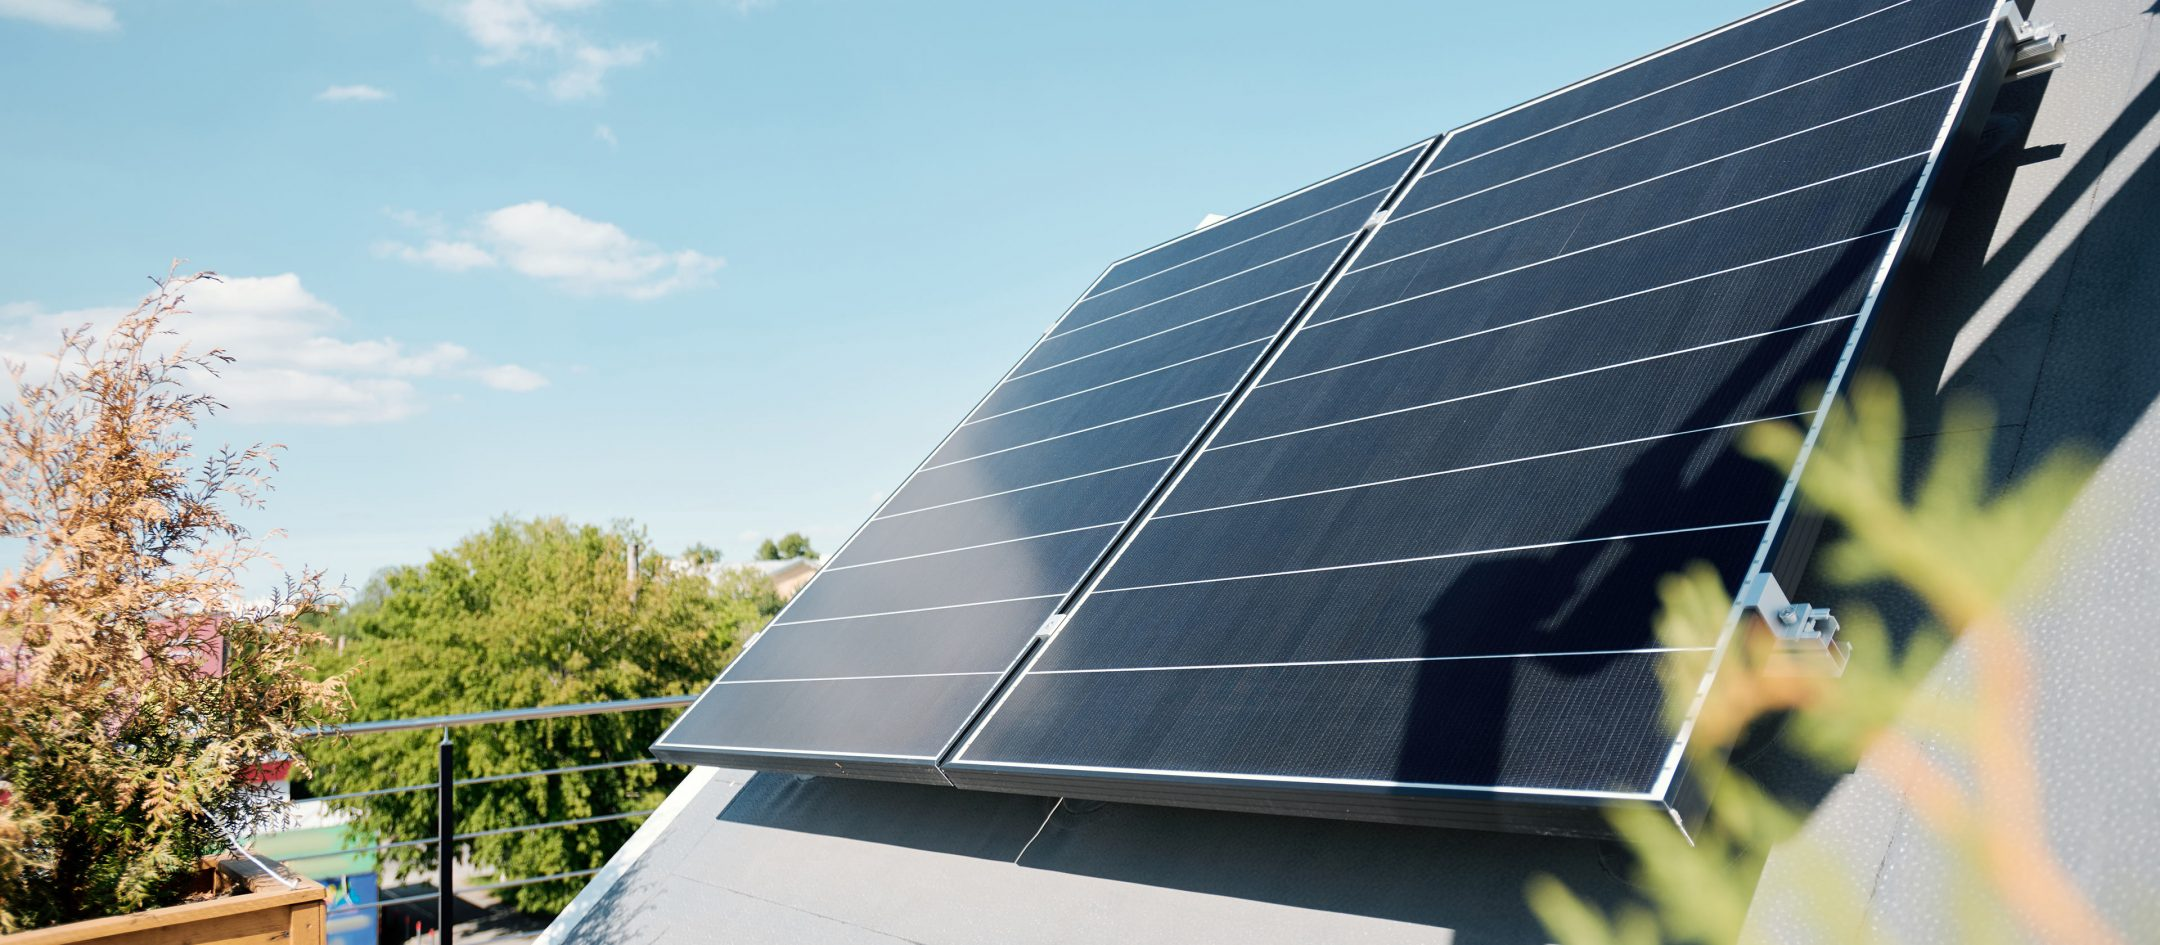 photovoltaik-power-to-heat-3840x1730